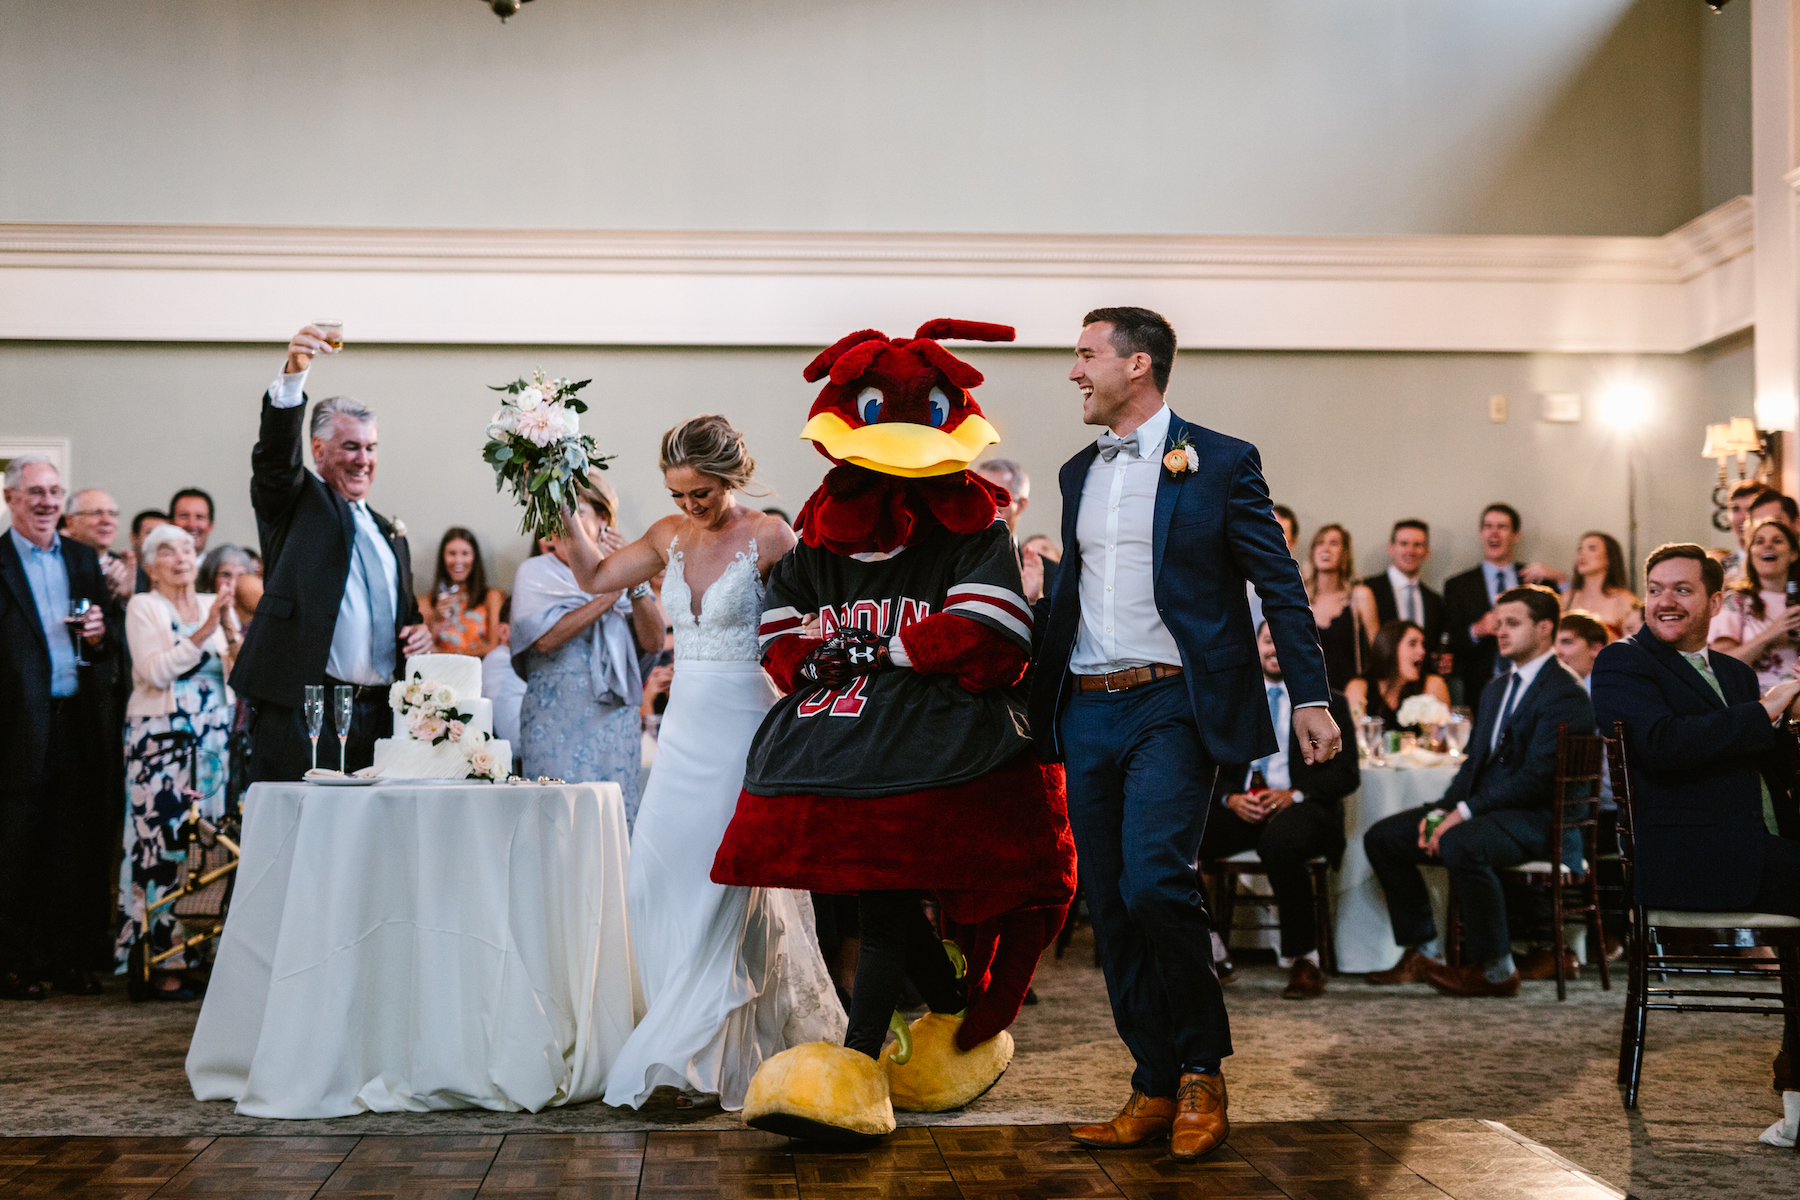 wedding-engagement-photographer-spartanburg-greenville-columbia-carolina-south-north-508.JPG